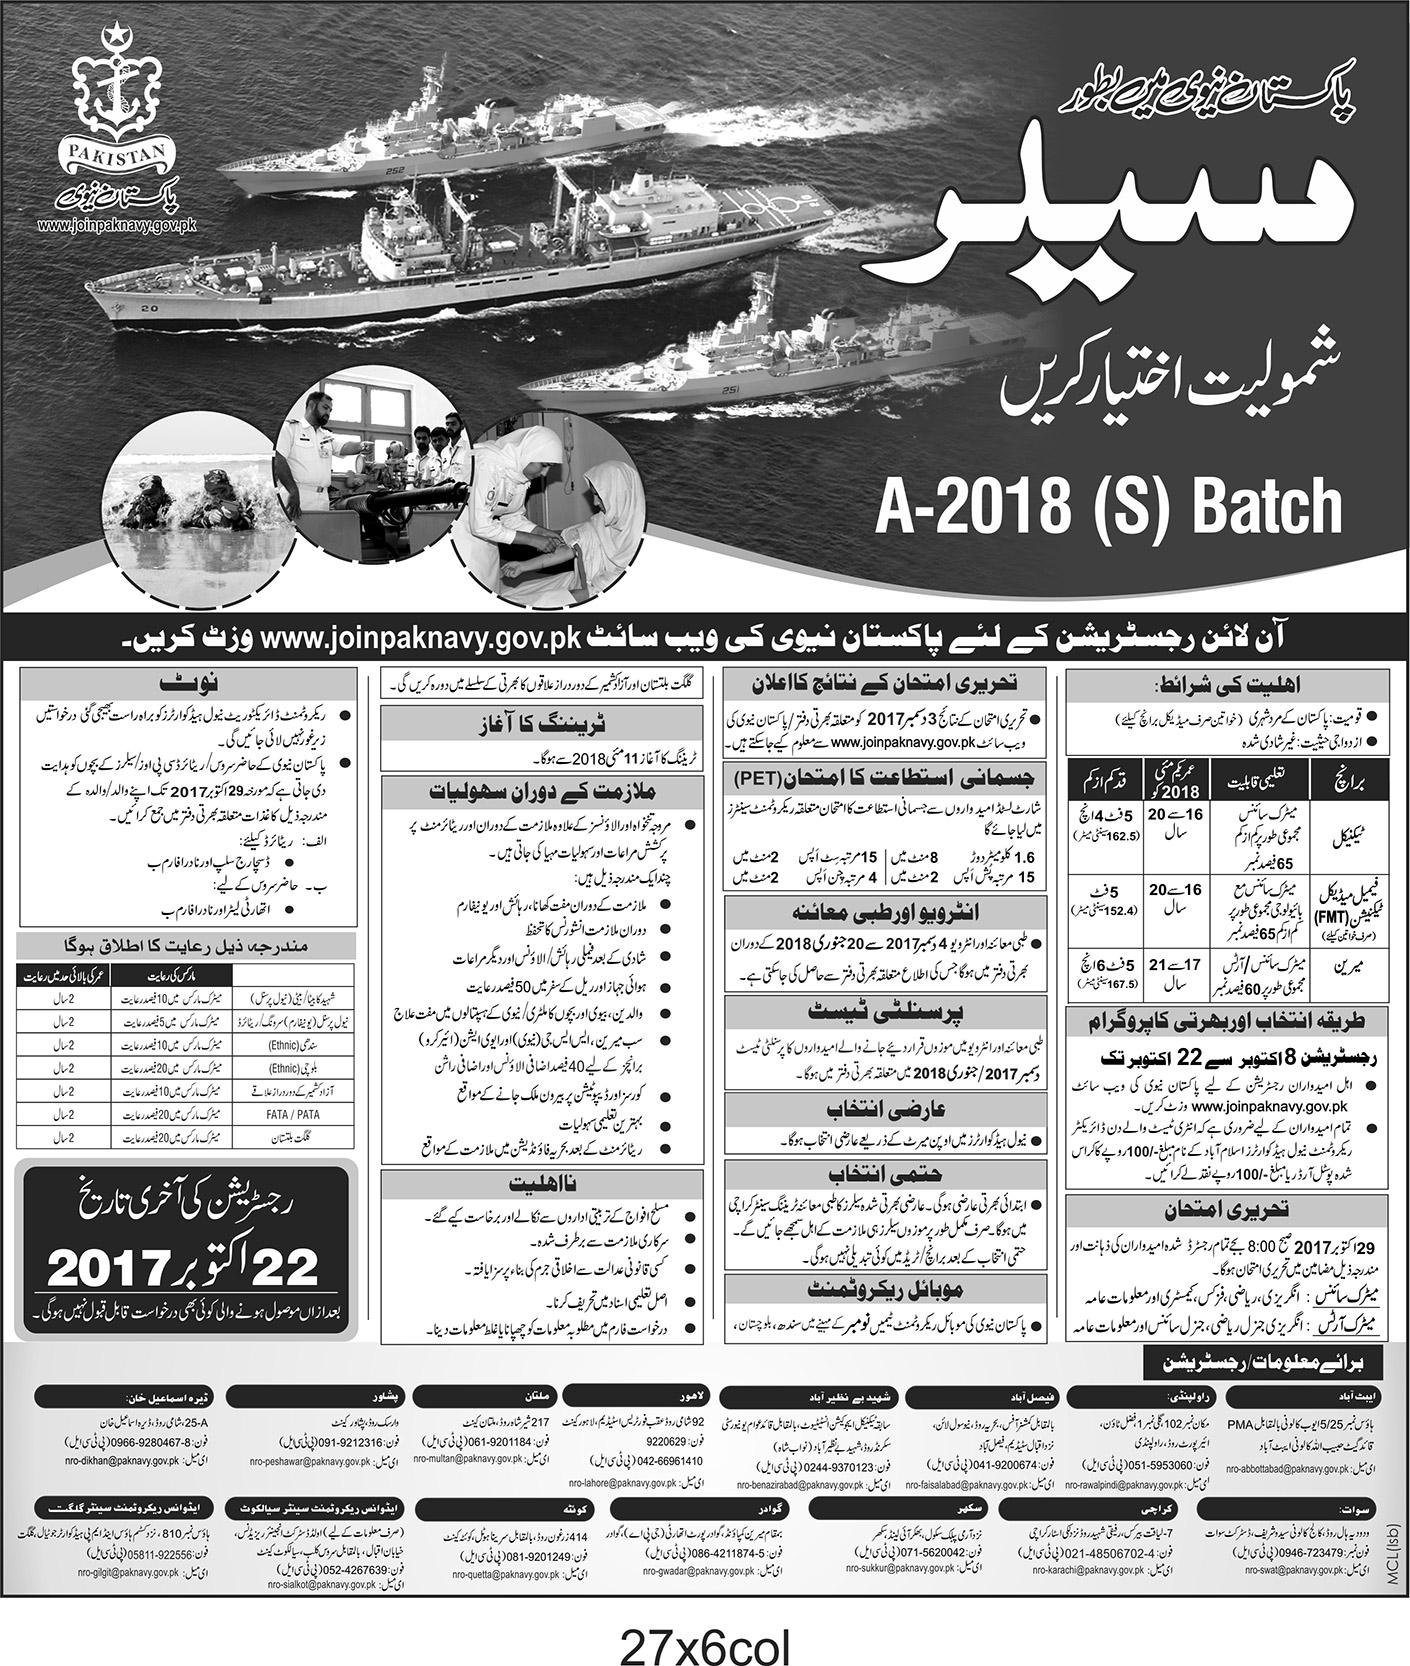 Join Pakistan Navy Sailor Batch C Jobs 2017 Online Registration Last Date